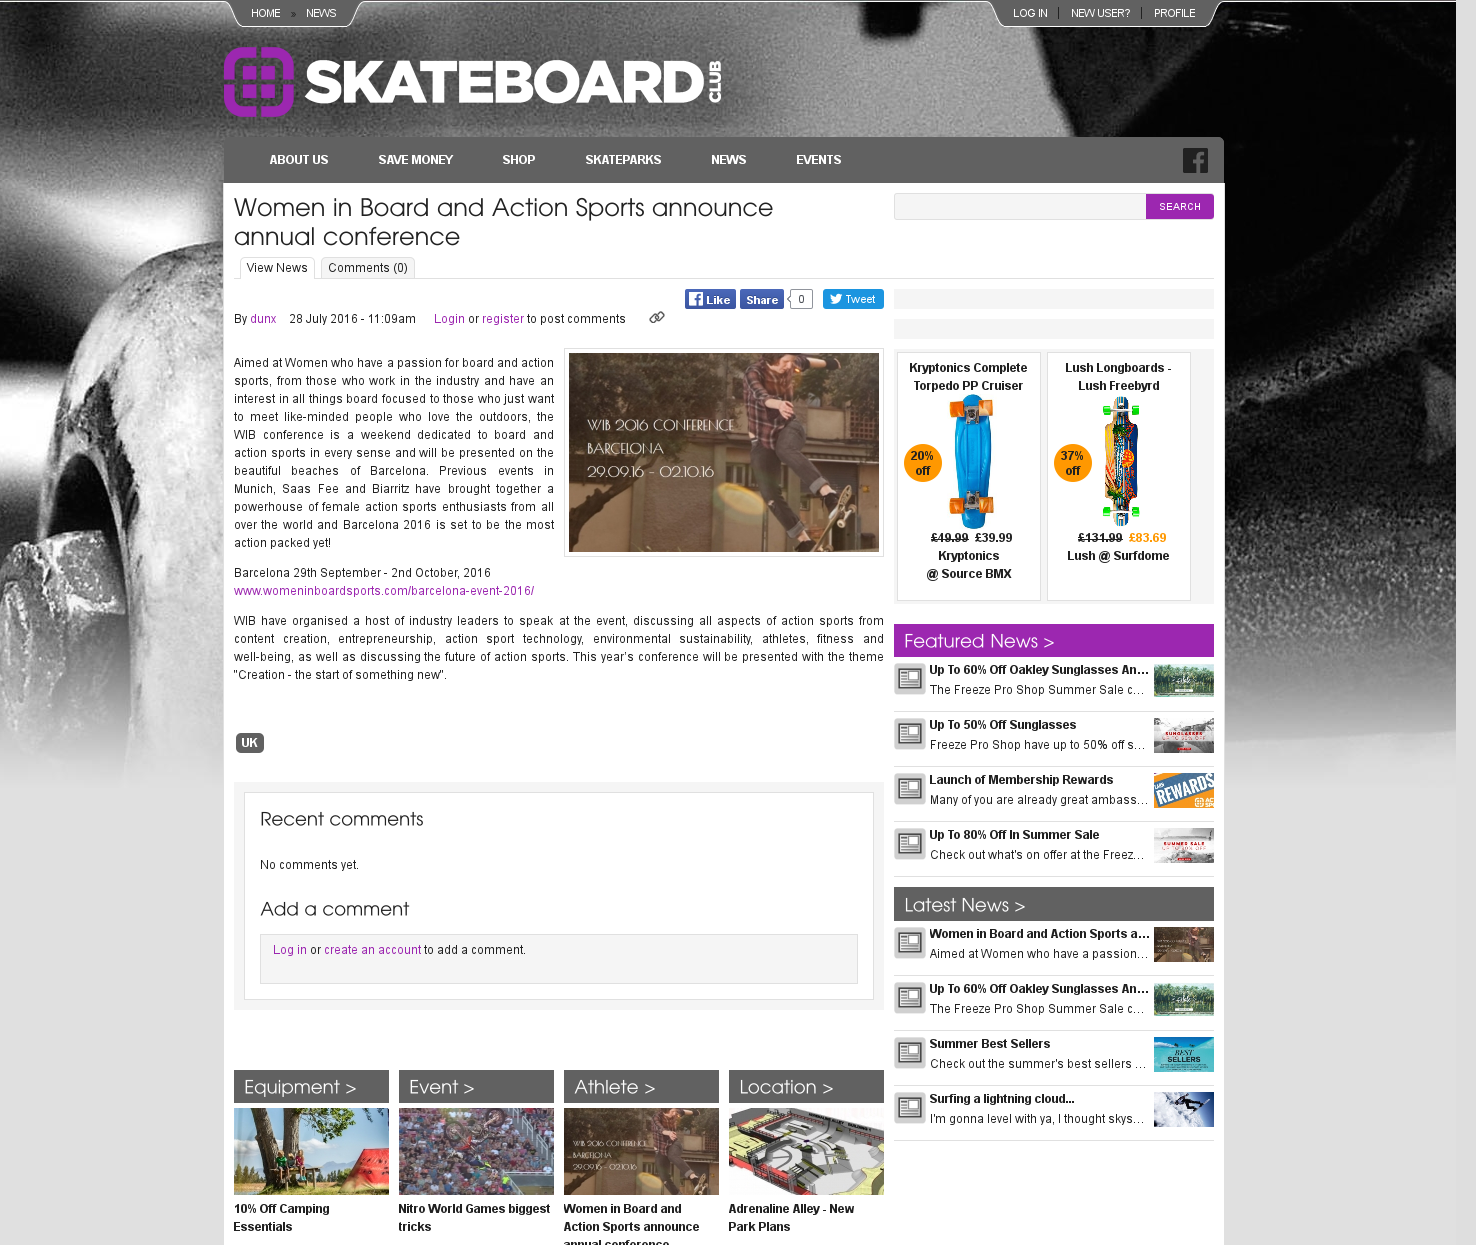 Skateboard club UK